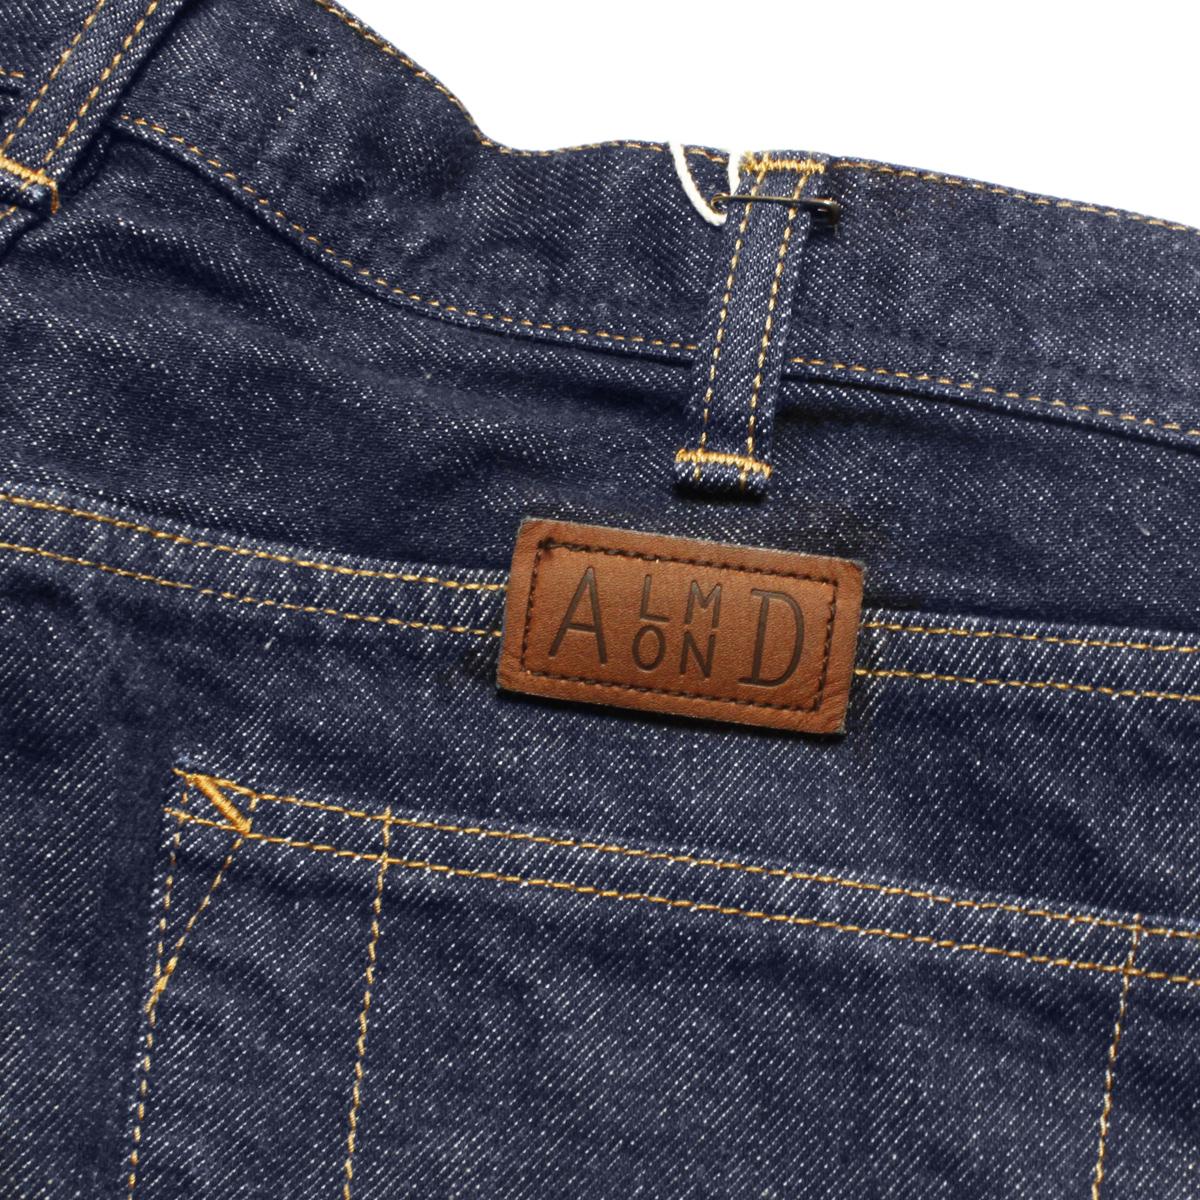 Almond Surf アーモンドサーフボードデザイン ORGANIC DENIM PANTS